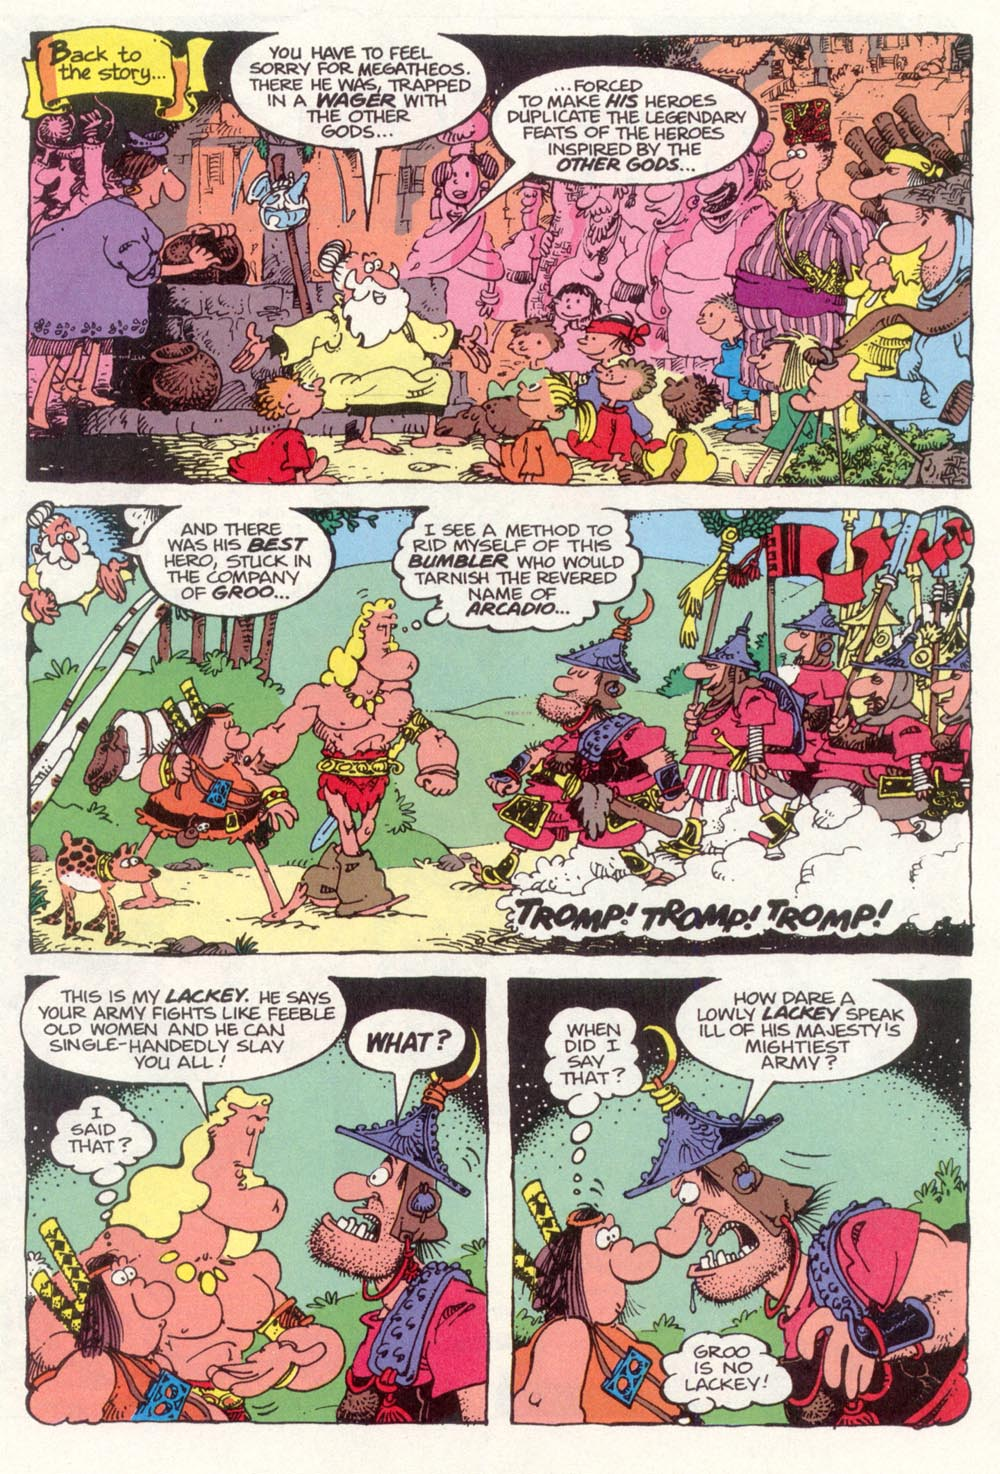 Read online Sergio Aragonés Groo the Wanderer comic -  Issue #98 - 3